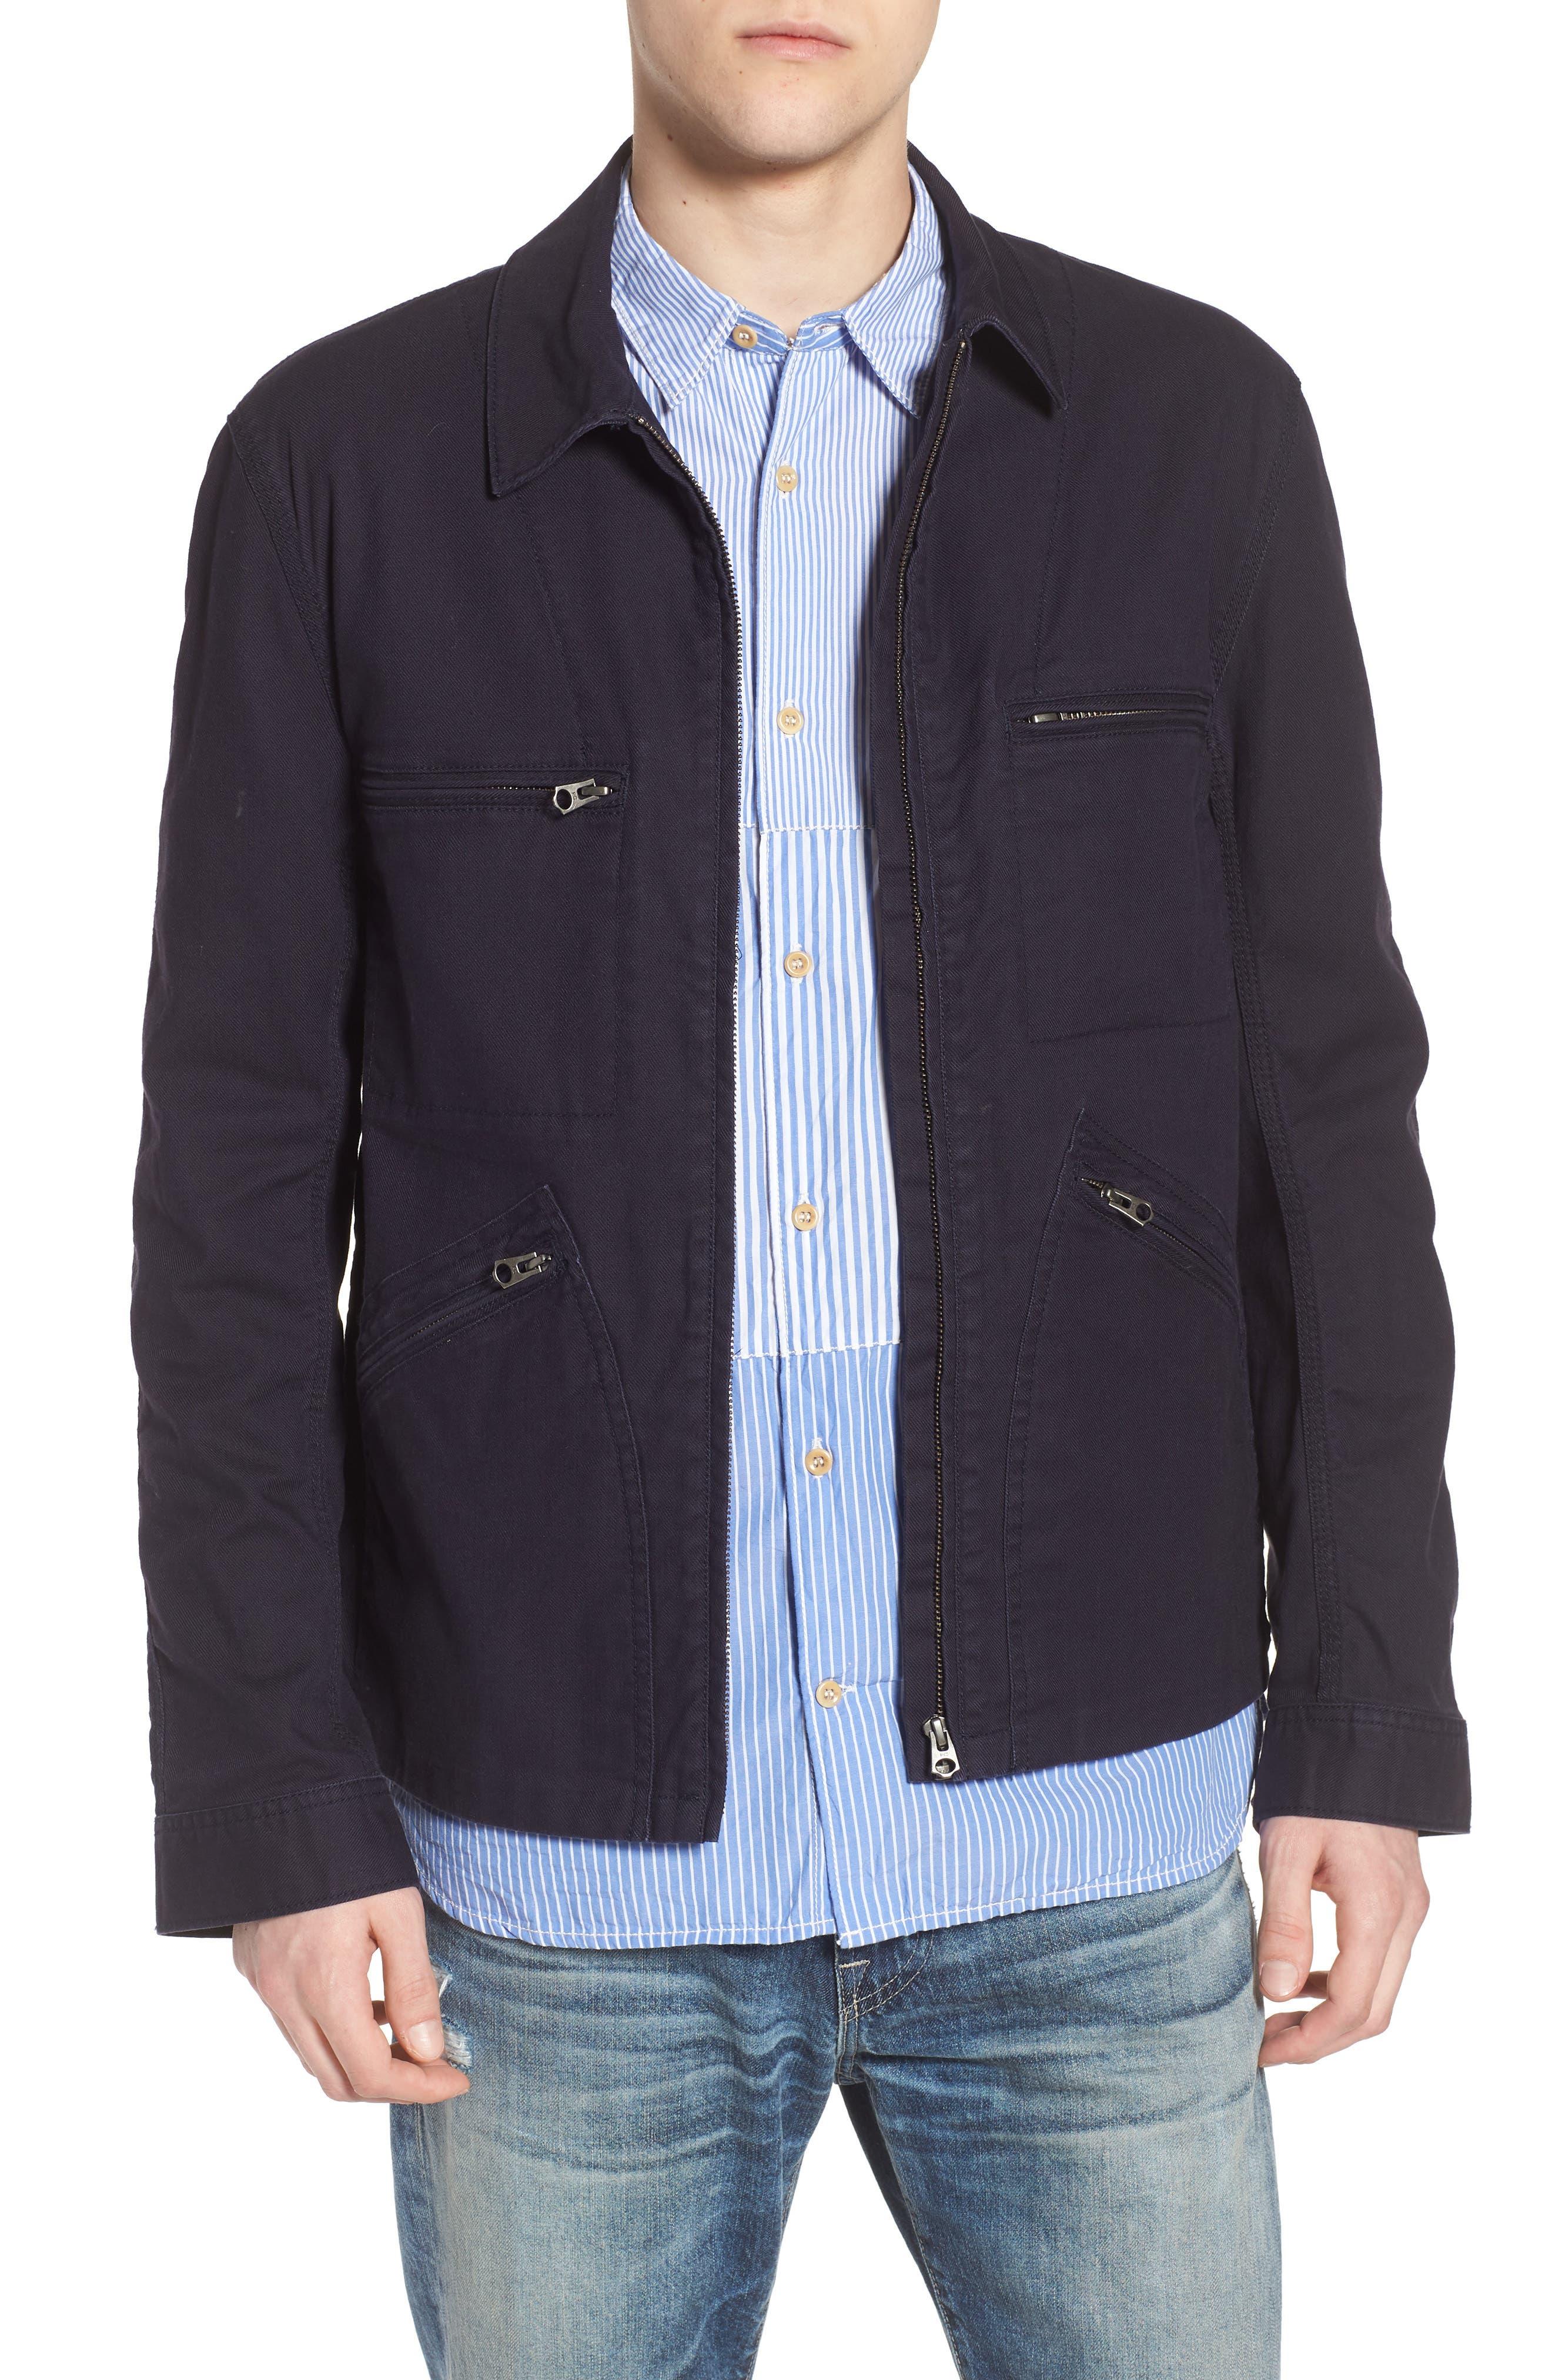 Slim Fit Slub Twill Cotton & Linen Jacket,                             Main thumbnail 1, color,                             001